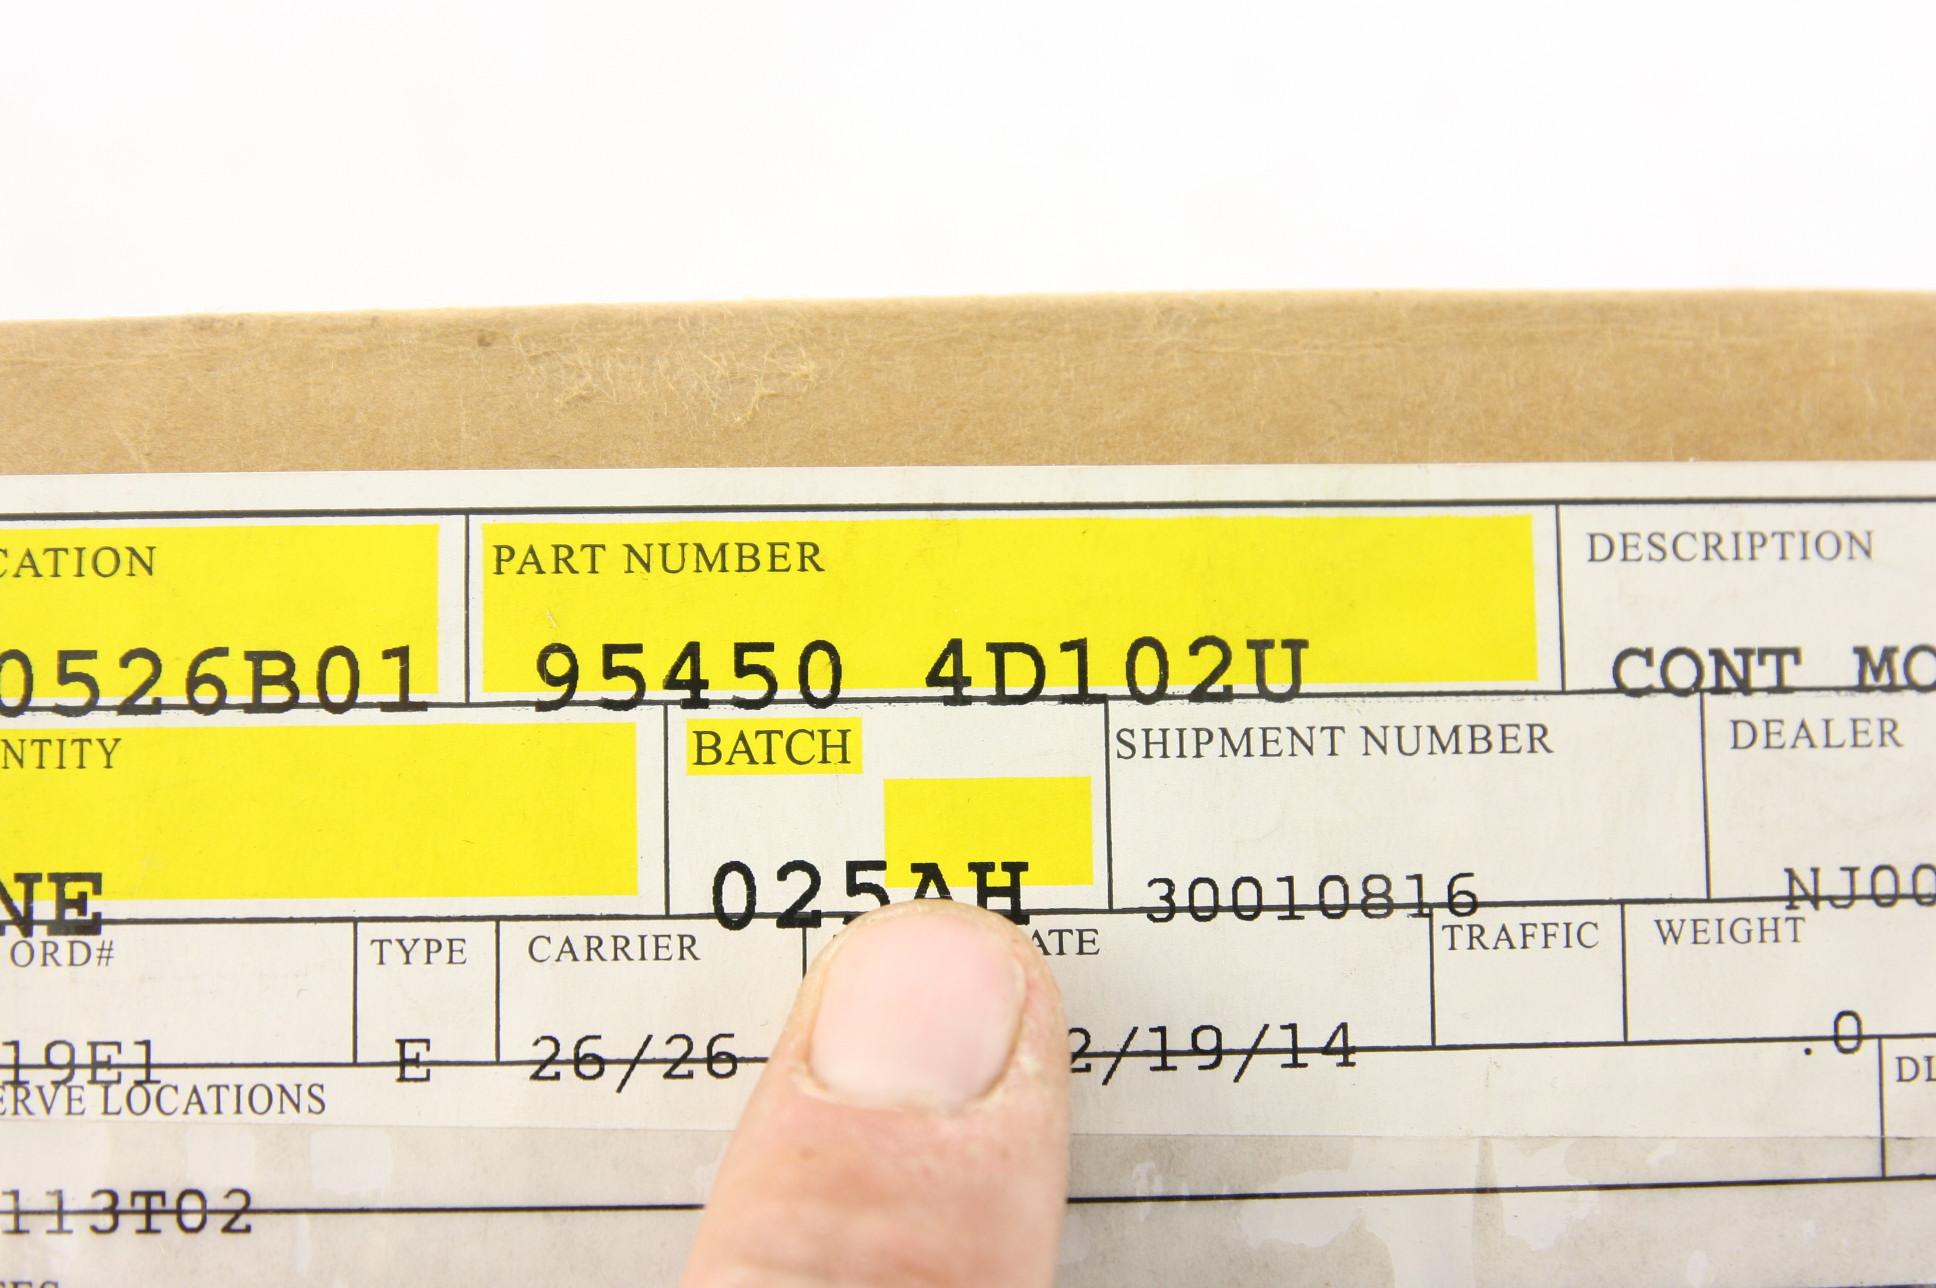 New Oem 954504d102 Kia Sedona Sliding Door Control Module Sealed Box